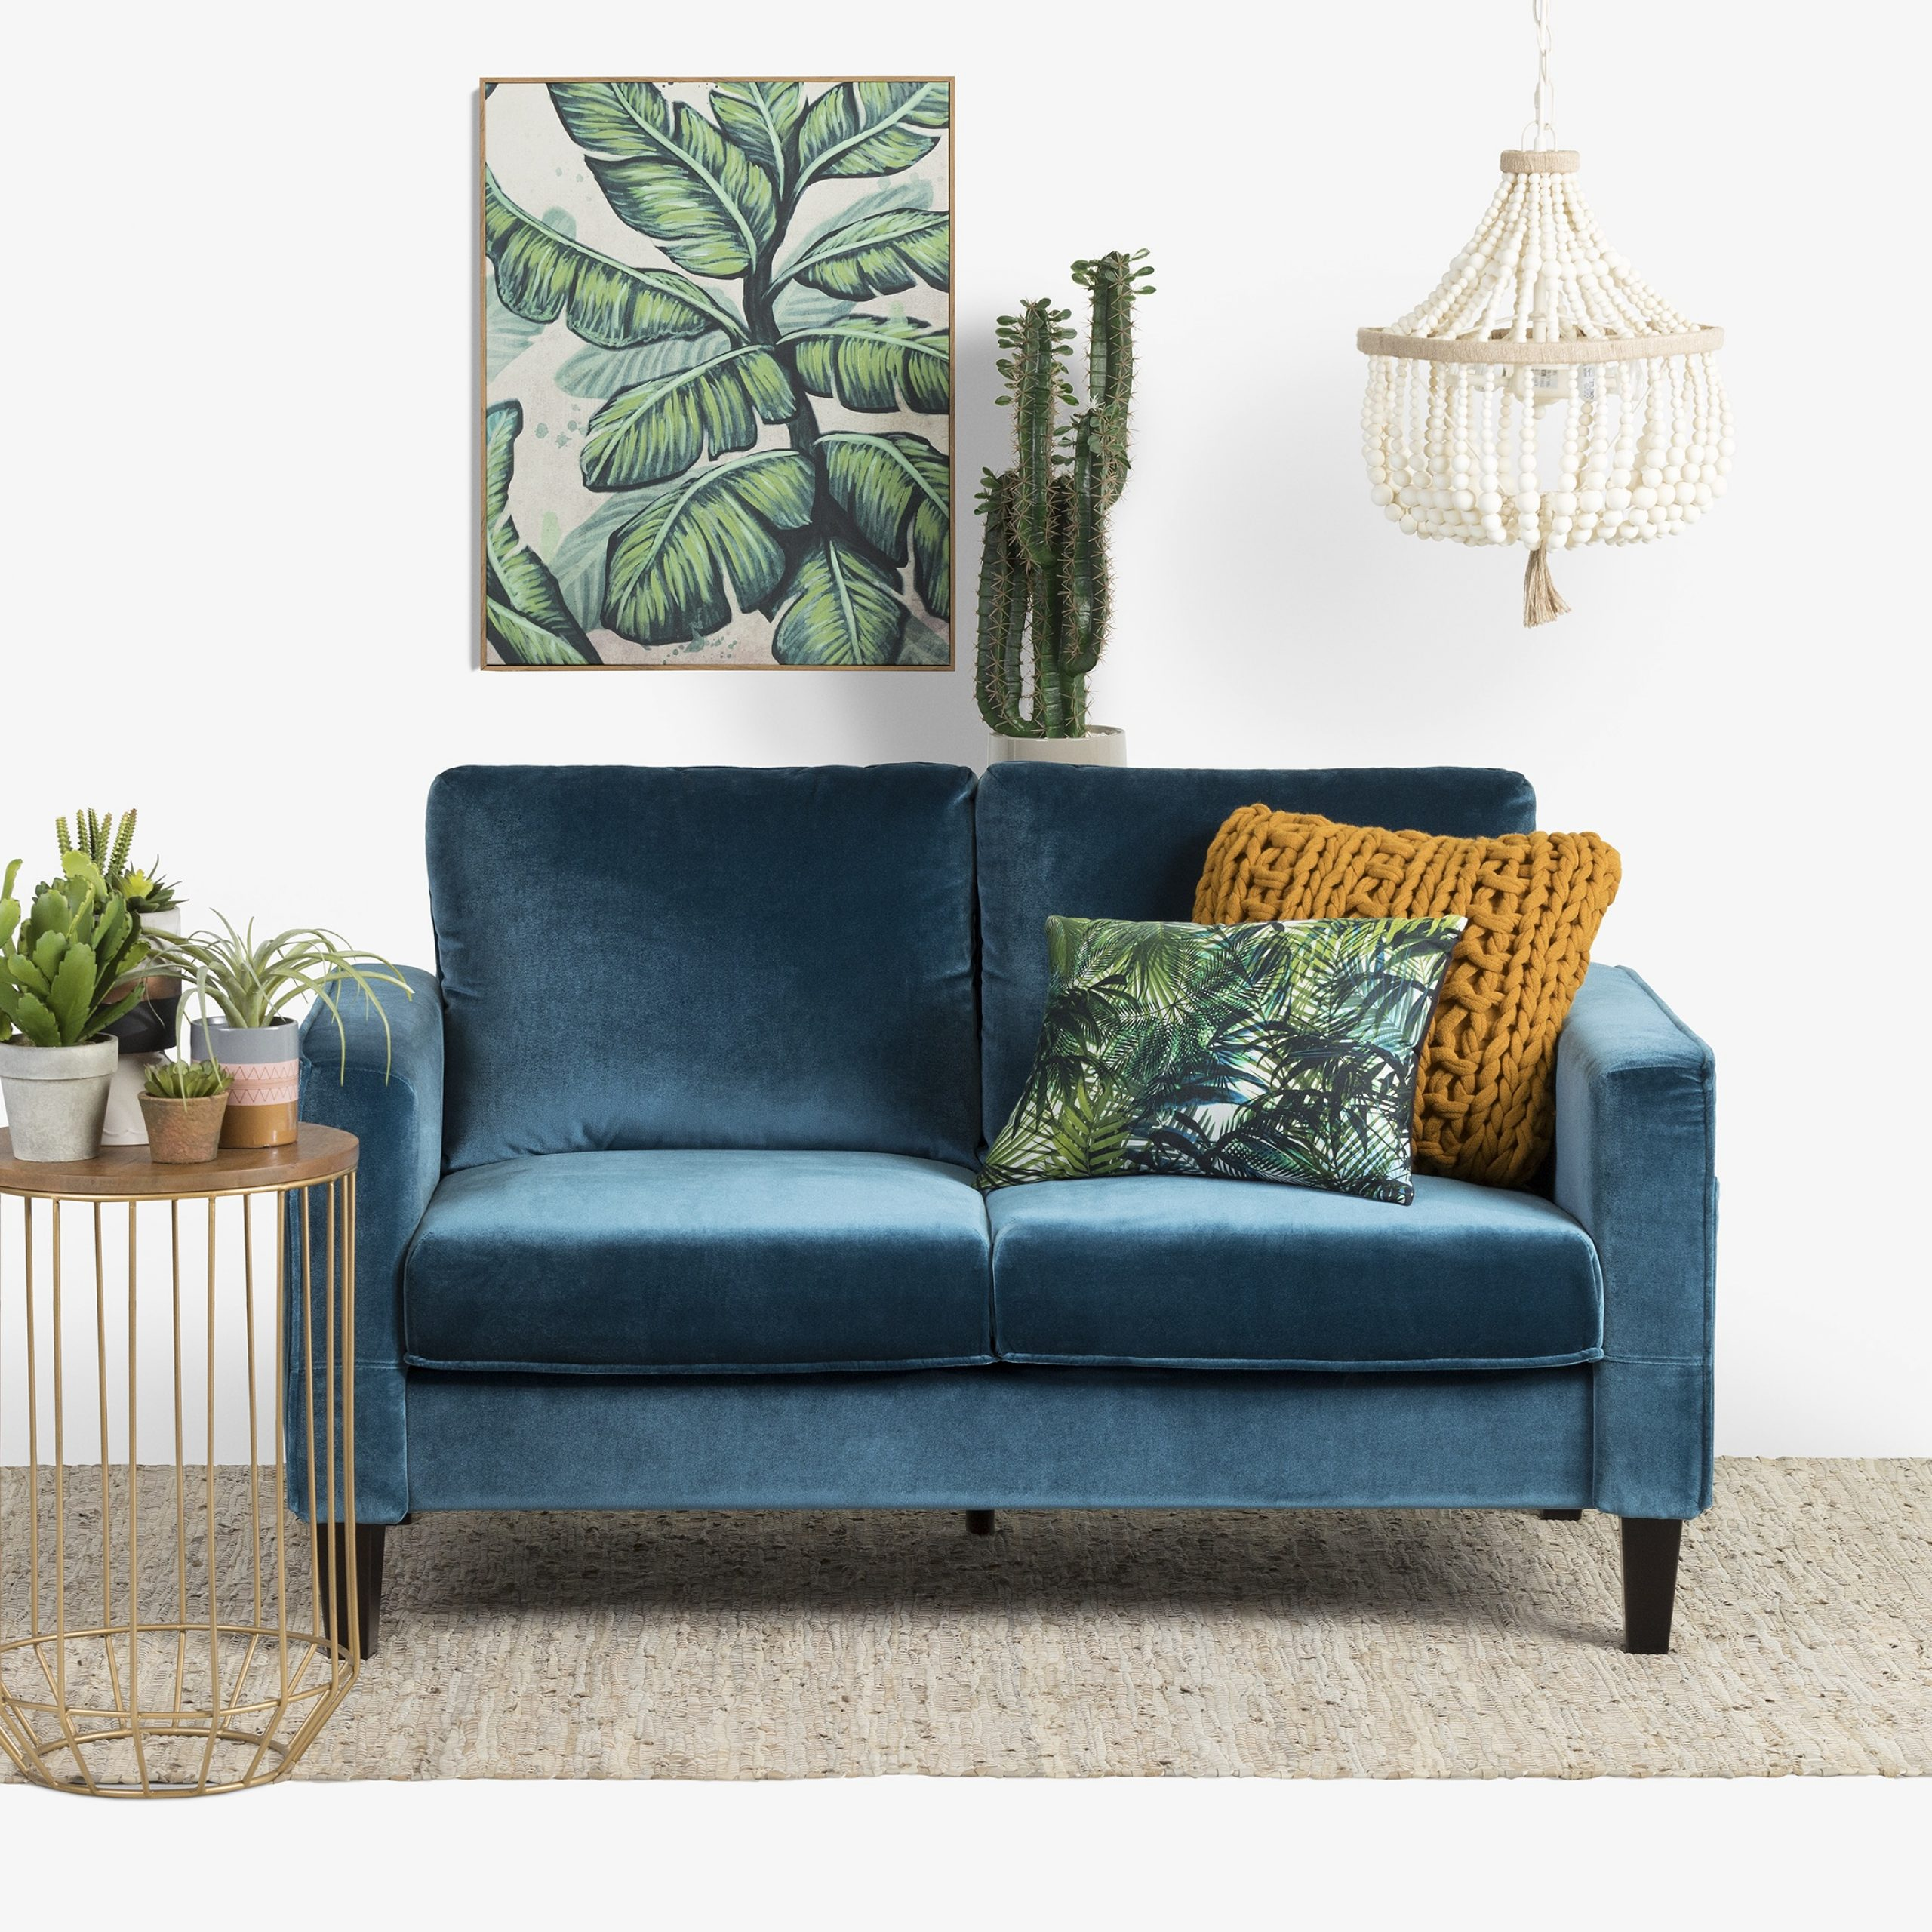 Furniture Lighting & Decor (View 19 of 20)